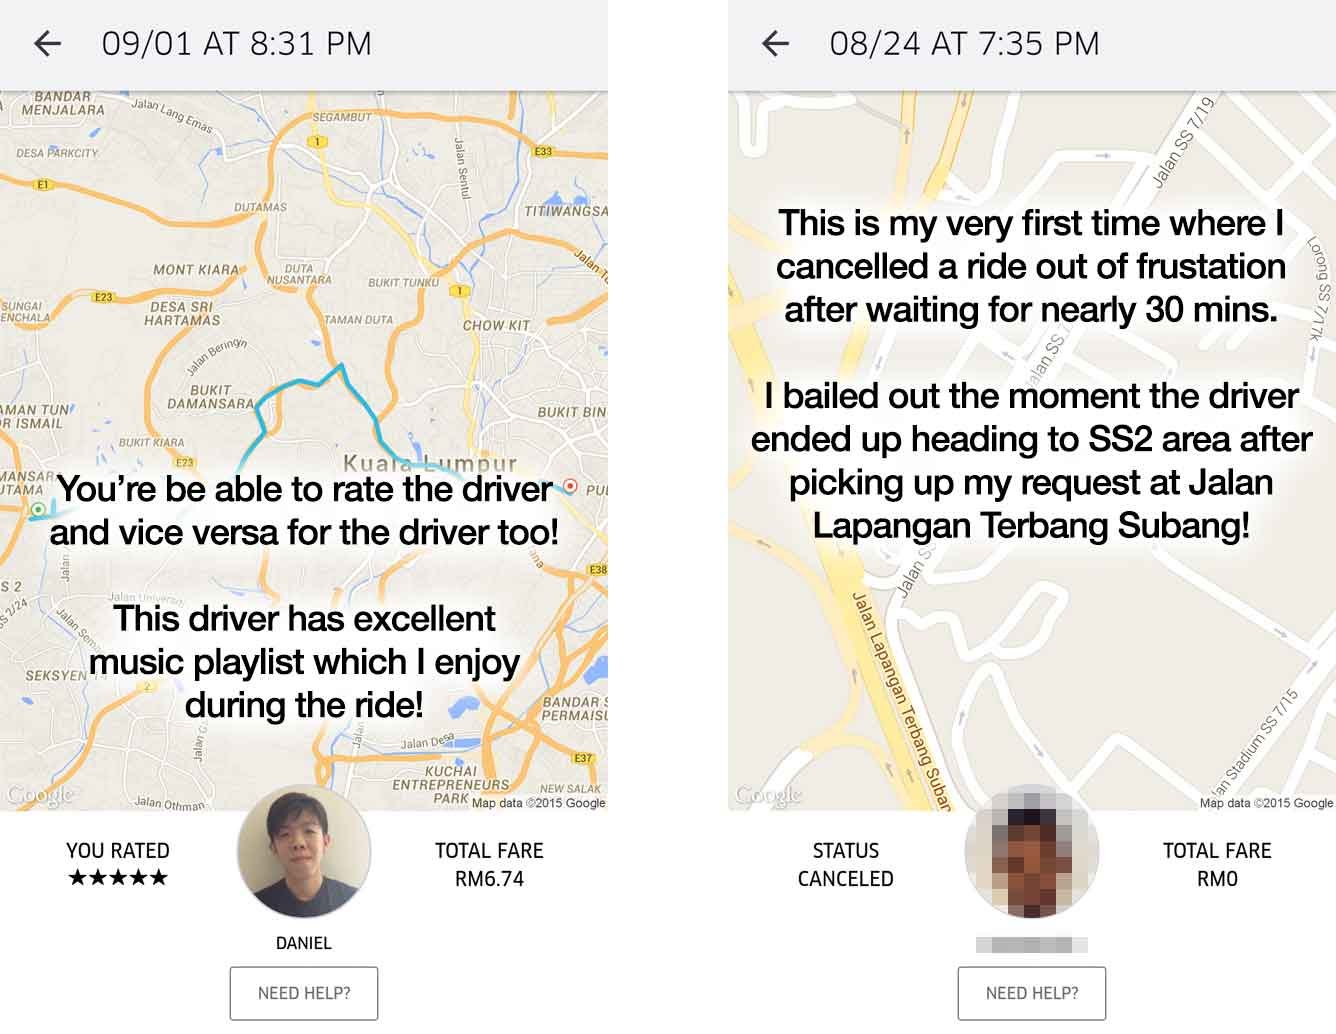 uber-awesome-sucks